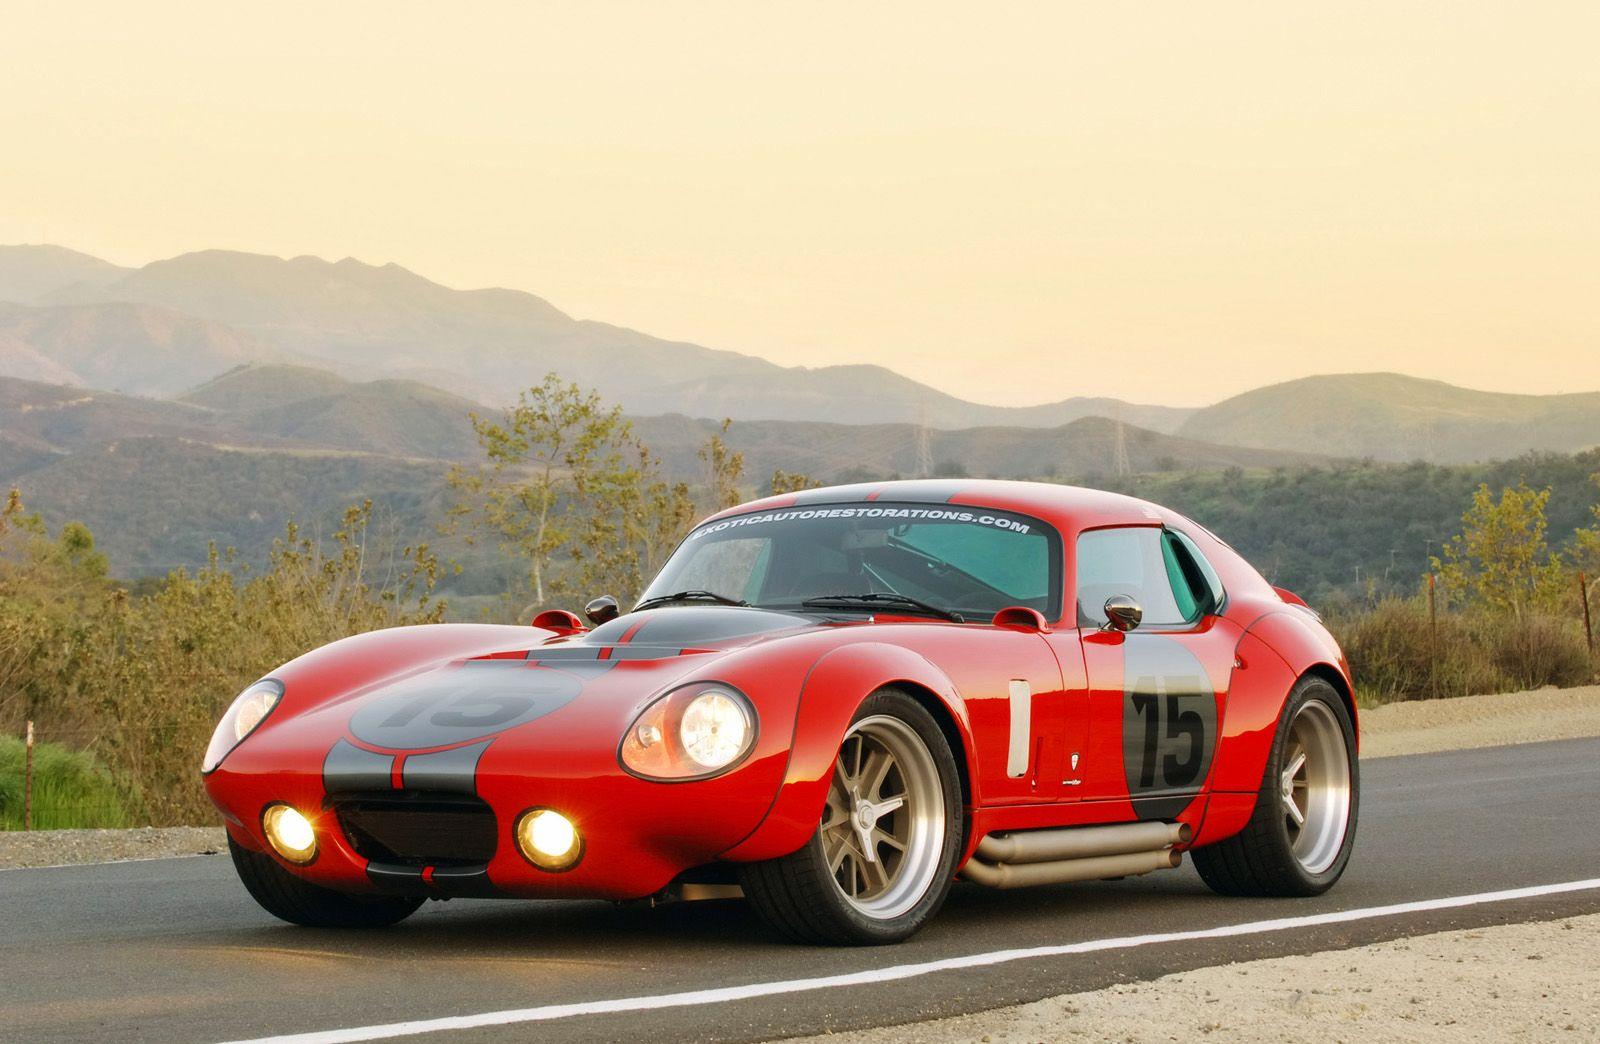 Shelby cobra daytona coupe le mans edition sports racing cars pinterest shelby daytona coupe and le mans